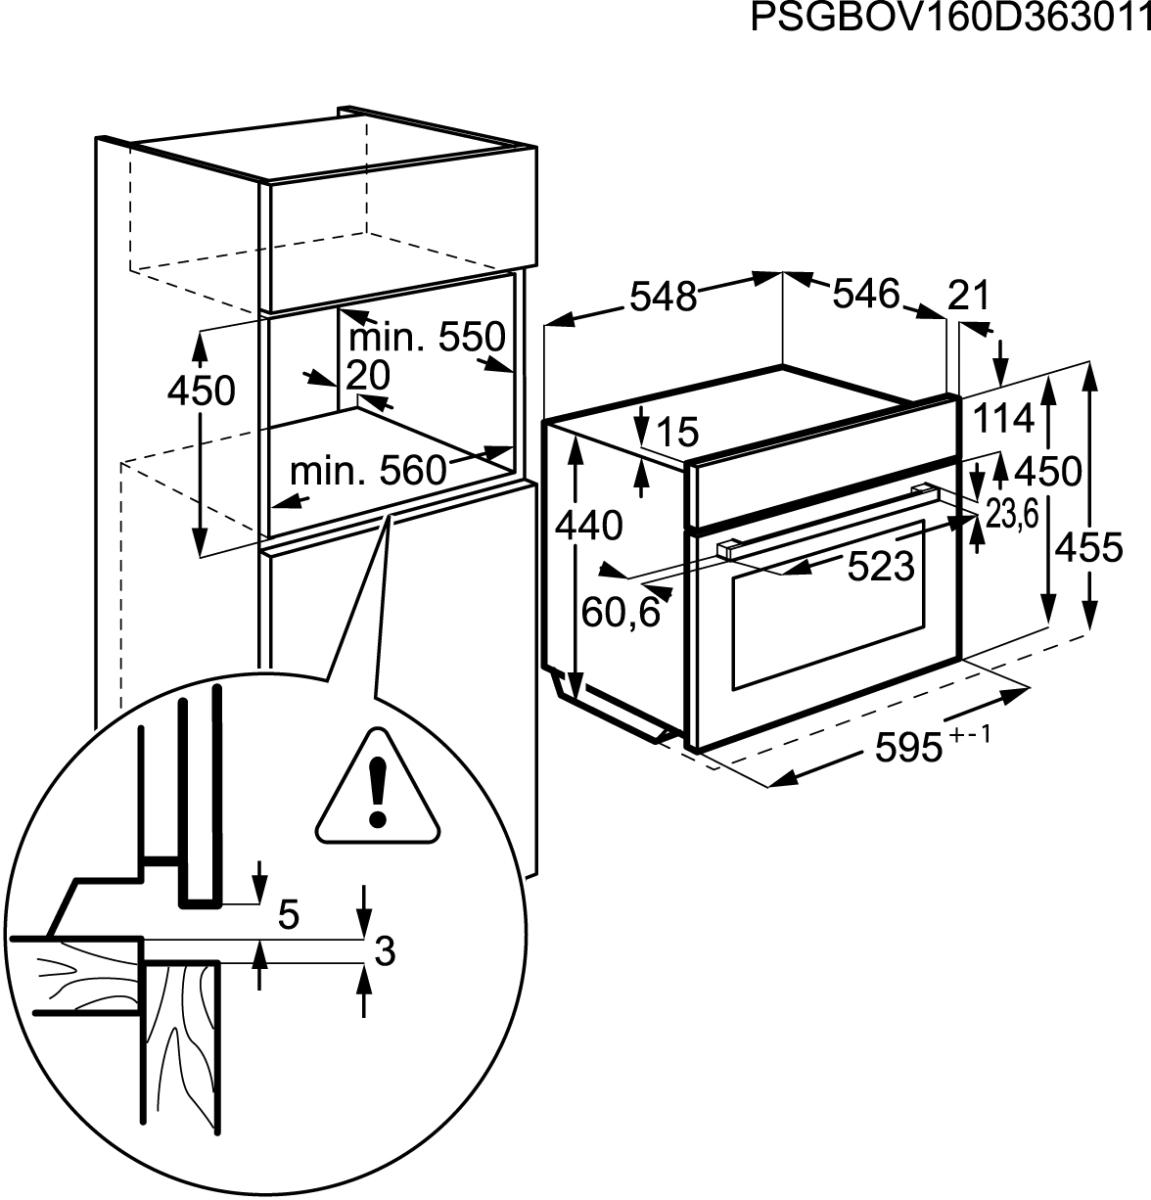 aeg kmk761000m kompakt backofen mit mikrowelle 45cm hoch g nstig kaufen. Black Bedroom Furniture Sets. Home Design Ideas